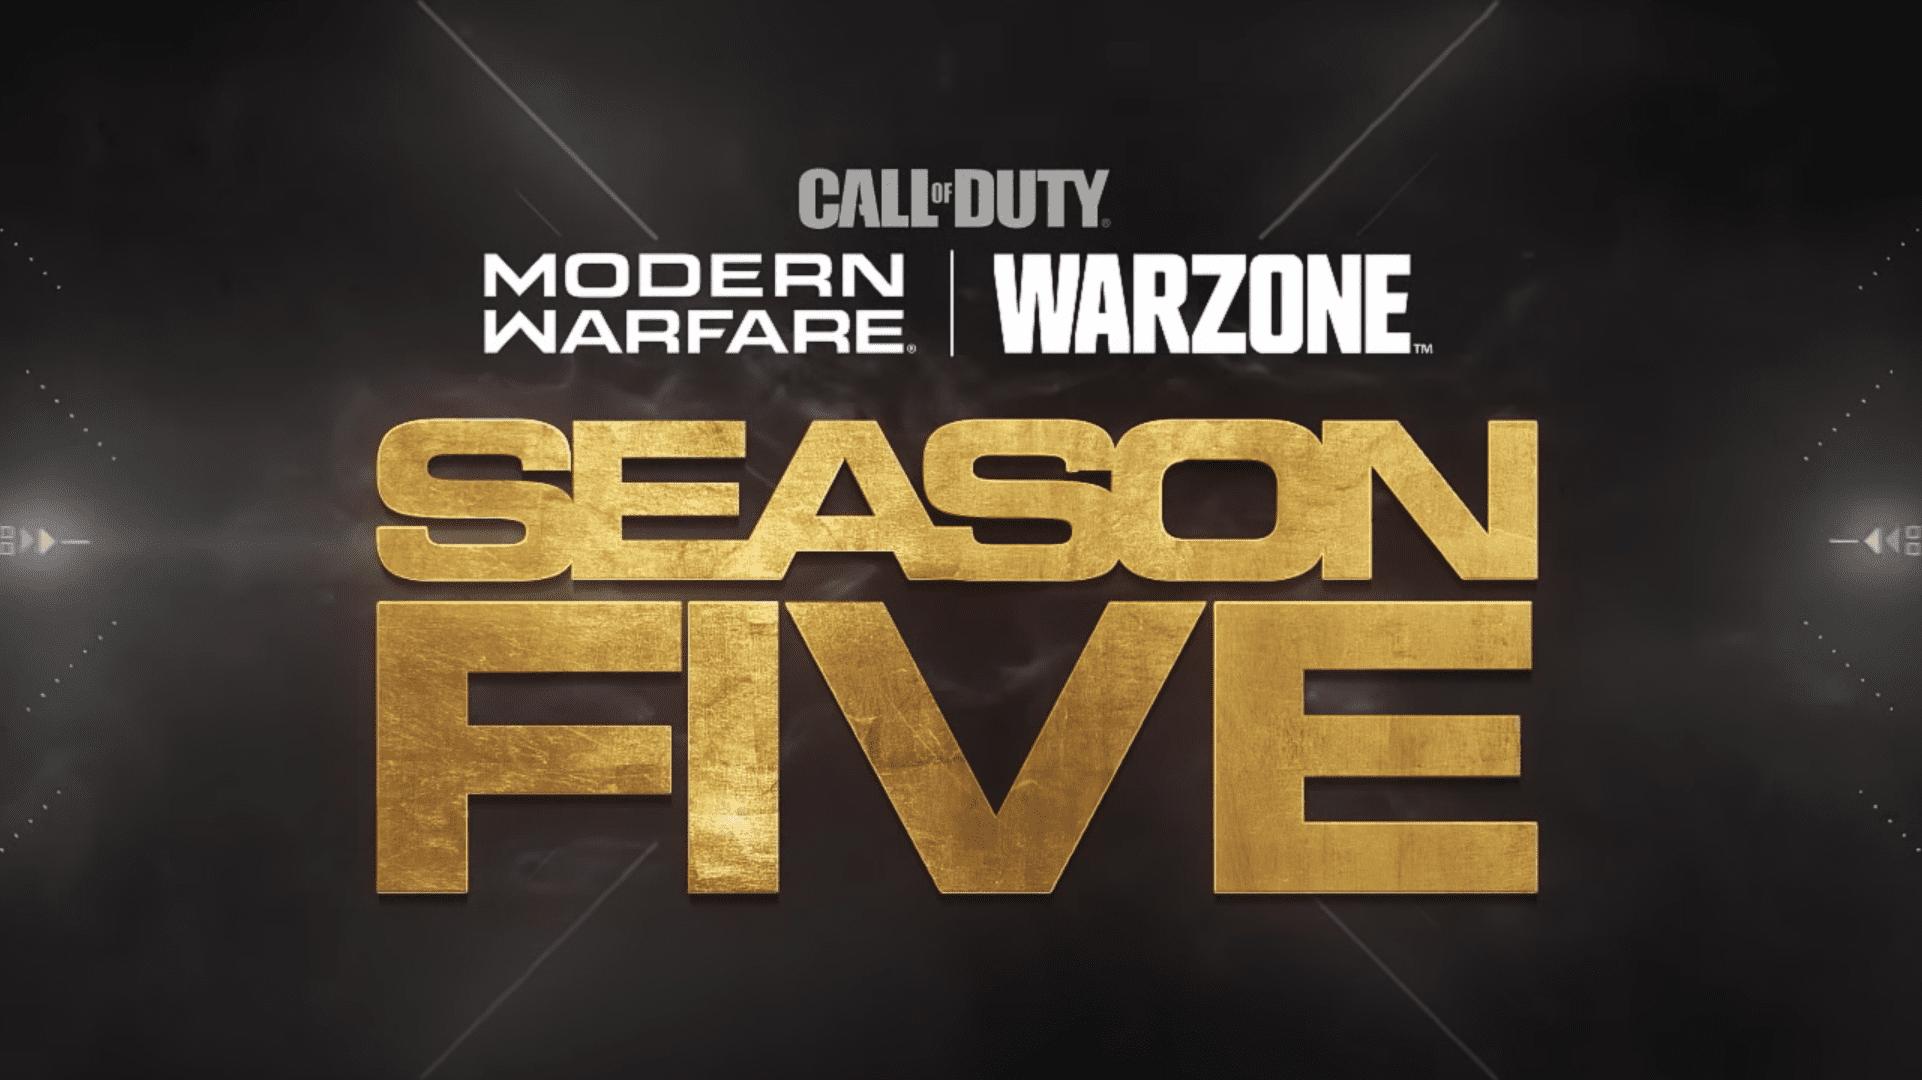 Call Of Duty Warzone Season 5 Trailer Reveals Shadow Company